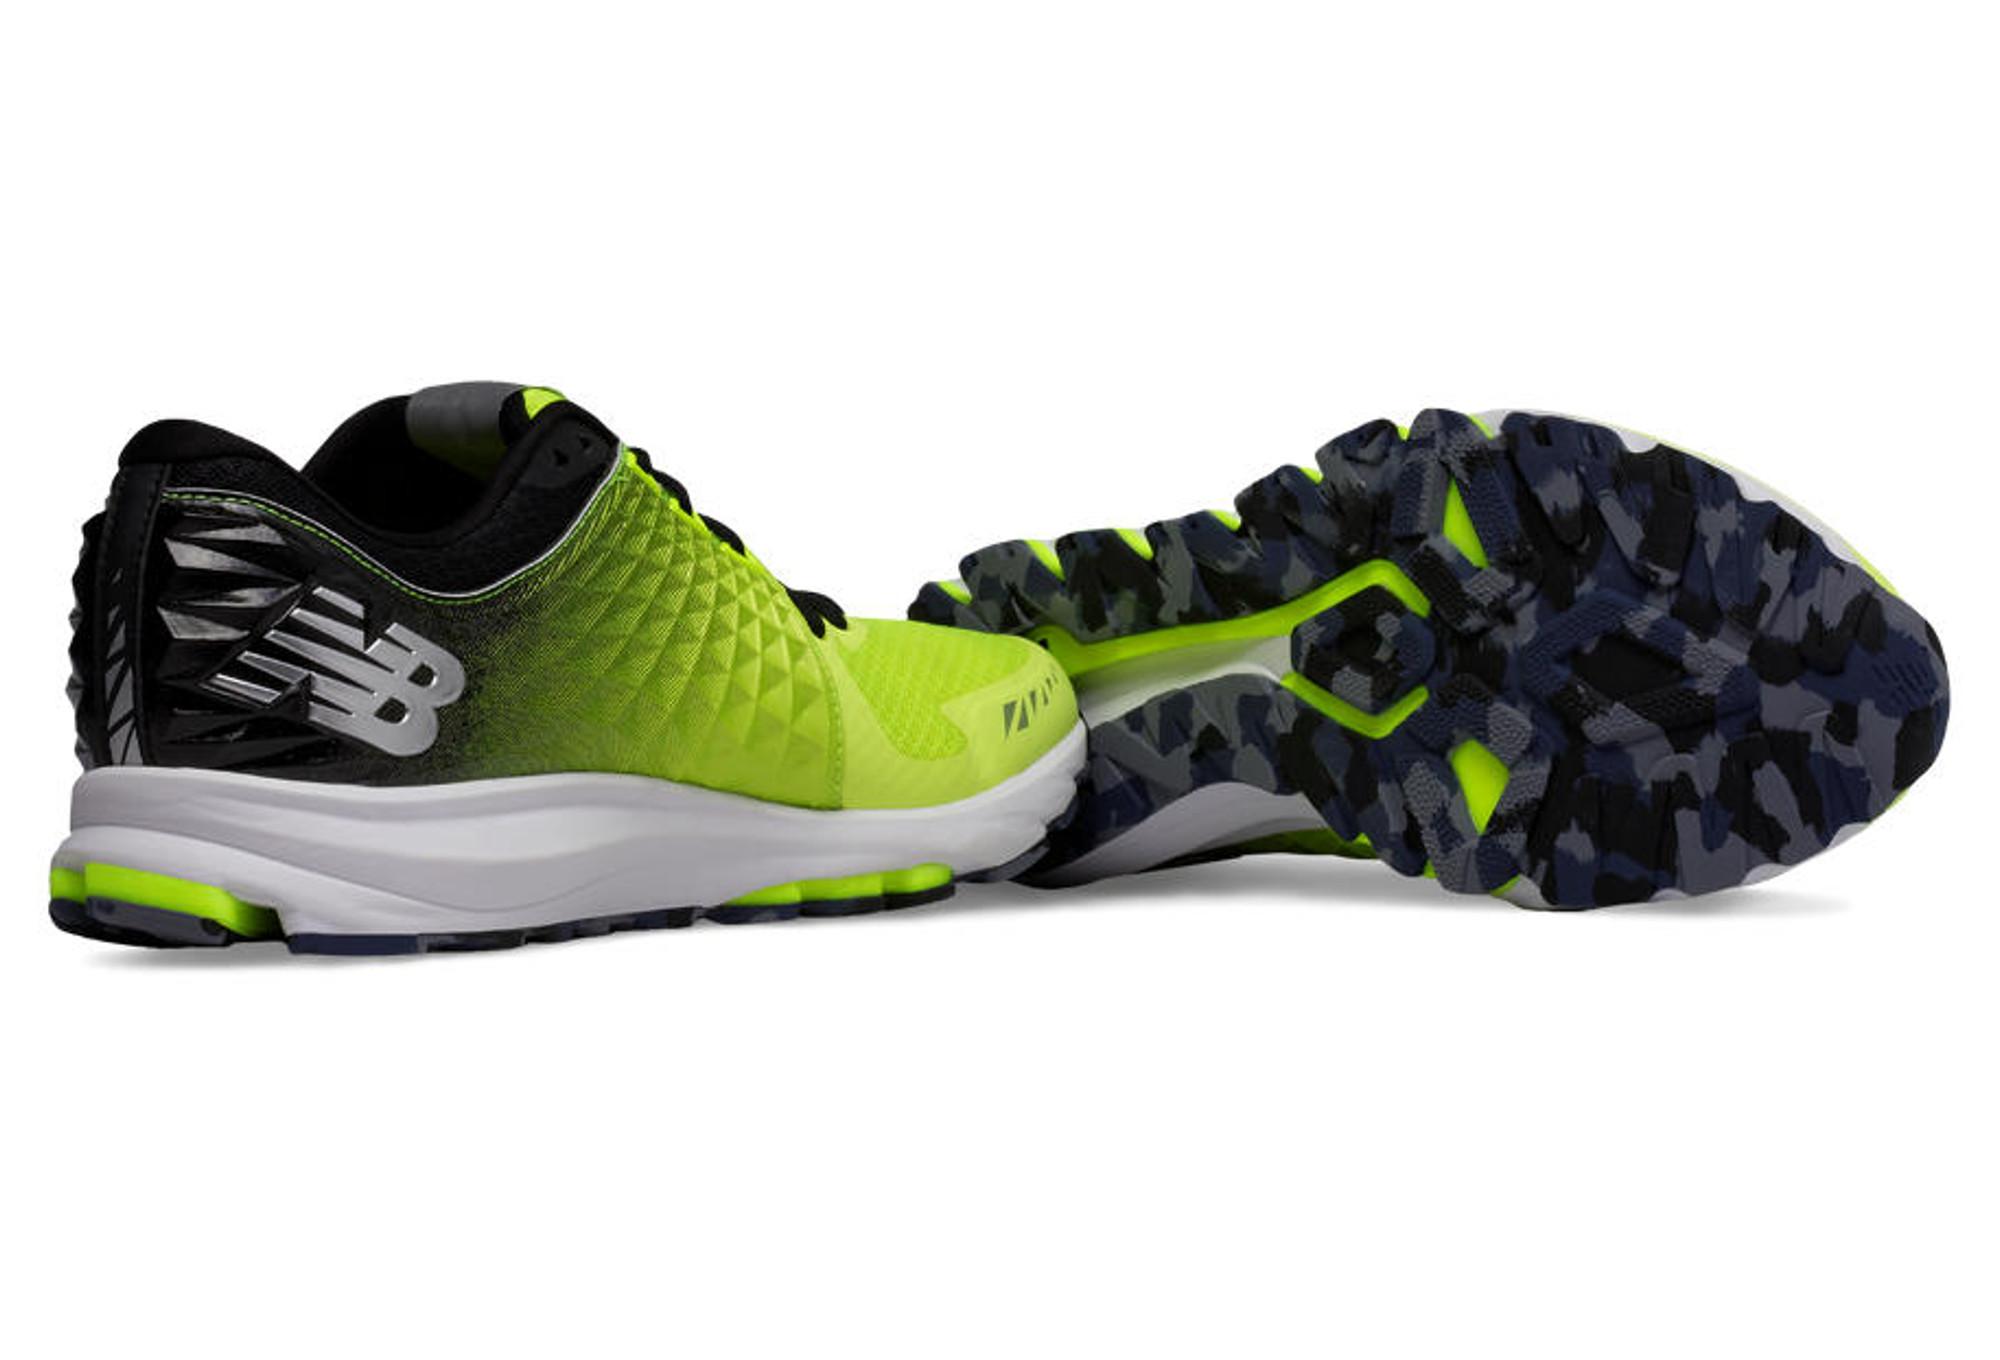 New 2090 Jaune Vazee Running Chaussures Balance De V1 1wqvnEA4